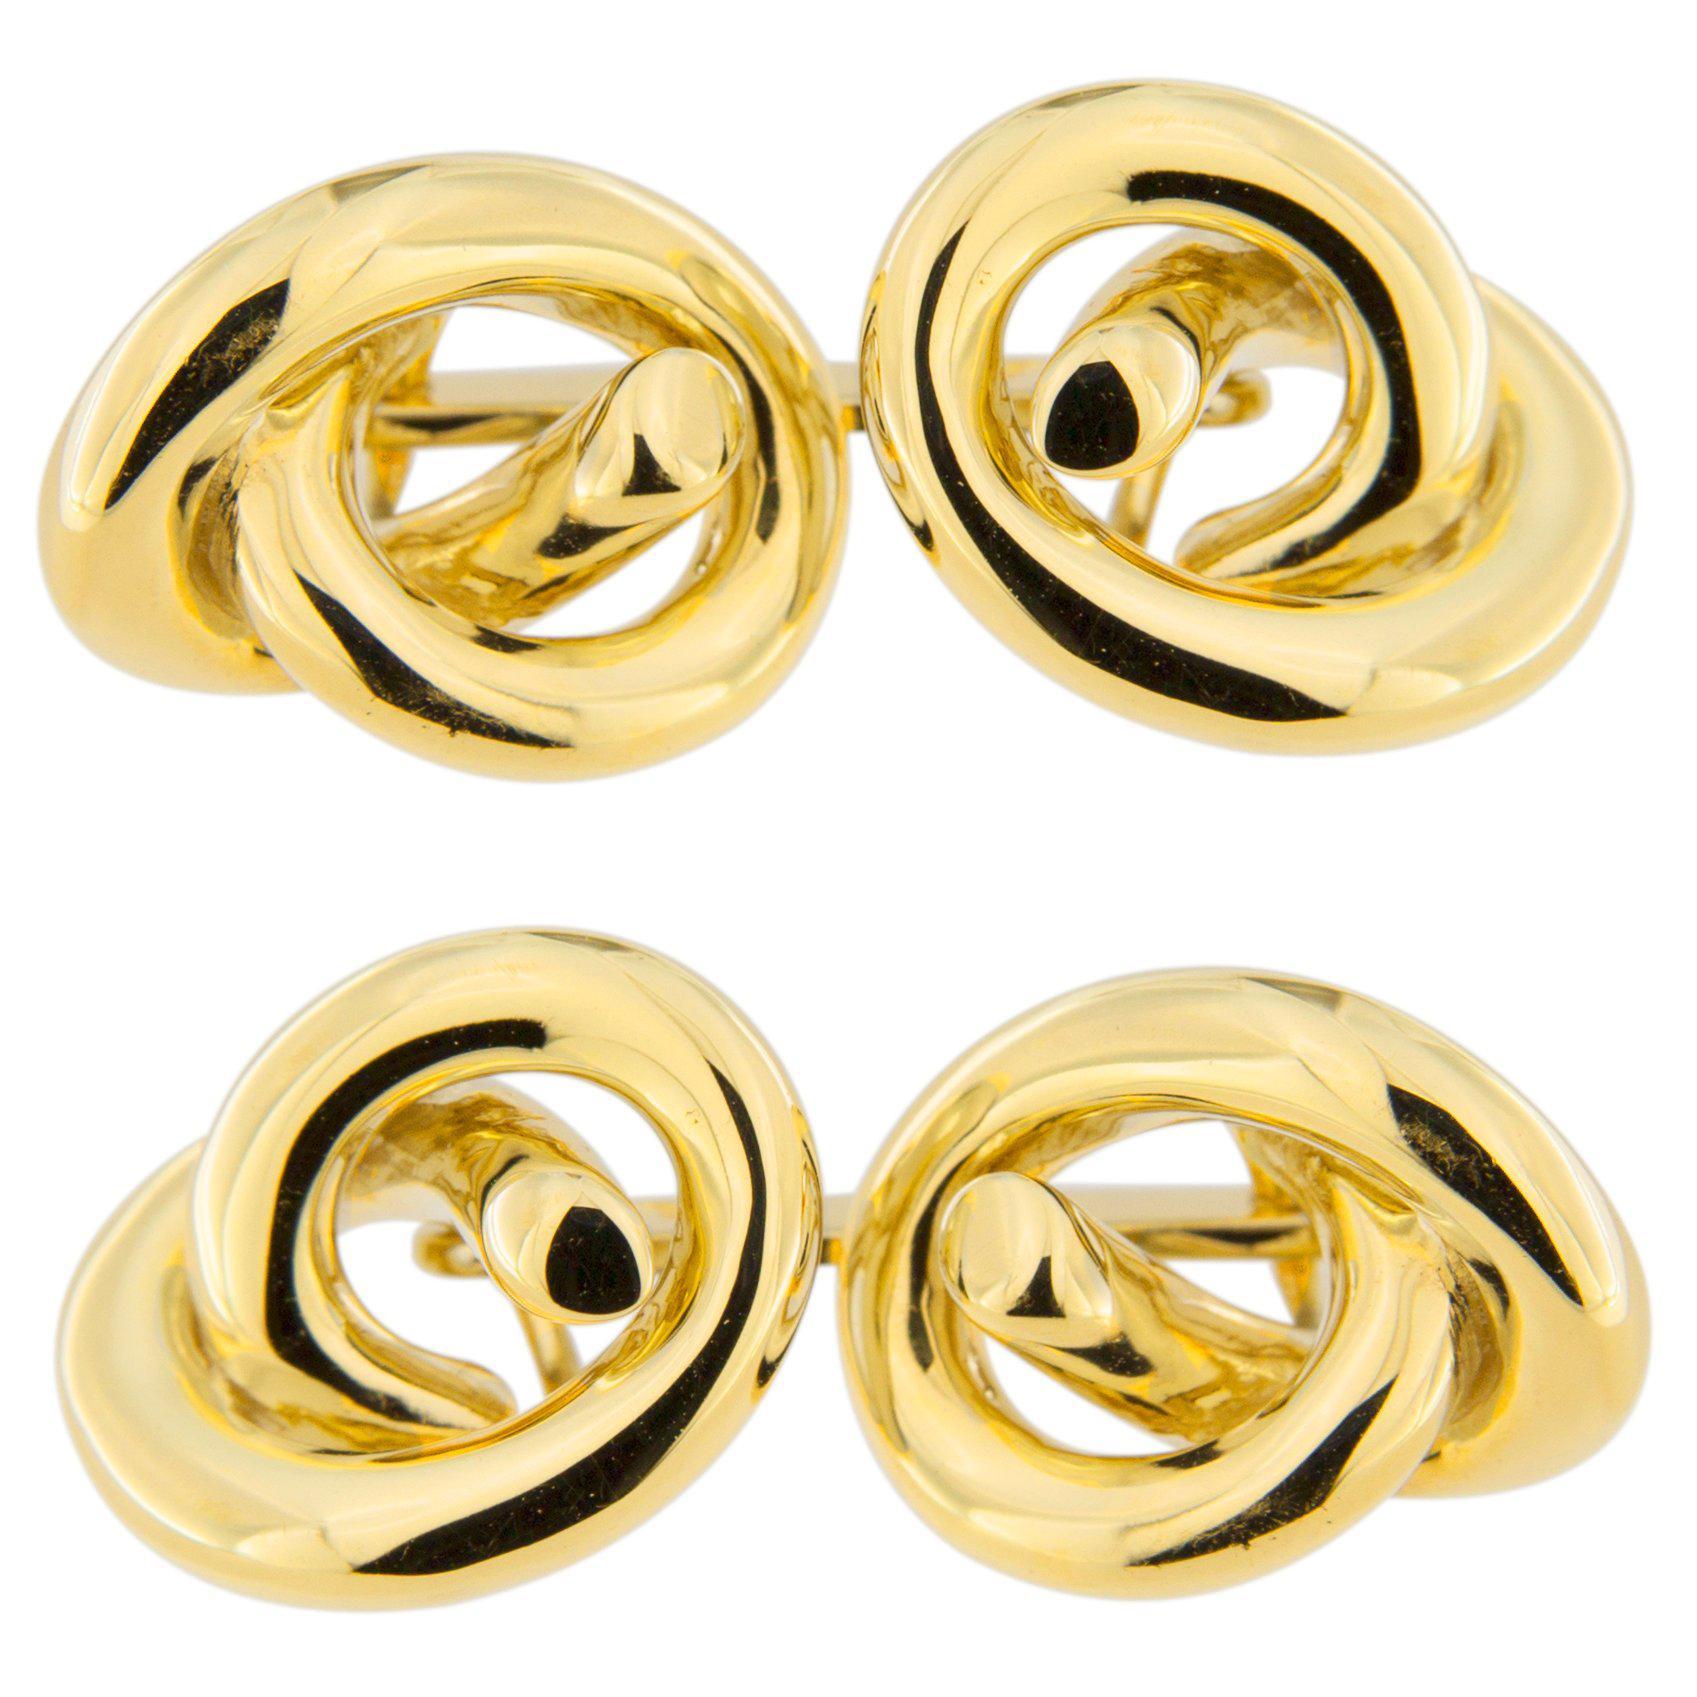 Jona Knot 18 Karat Yellow Gold Cufflinks